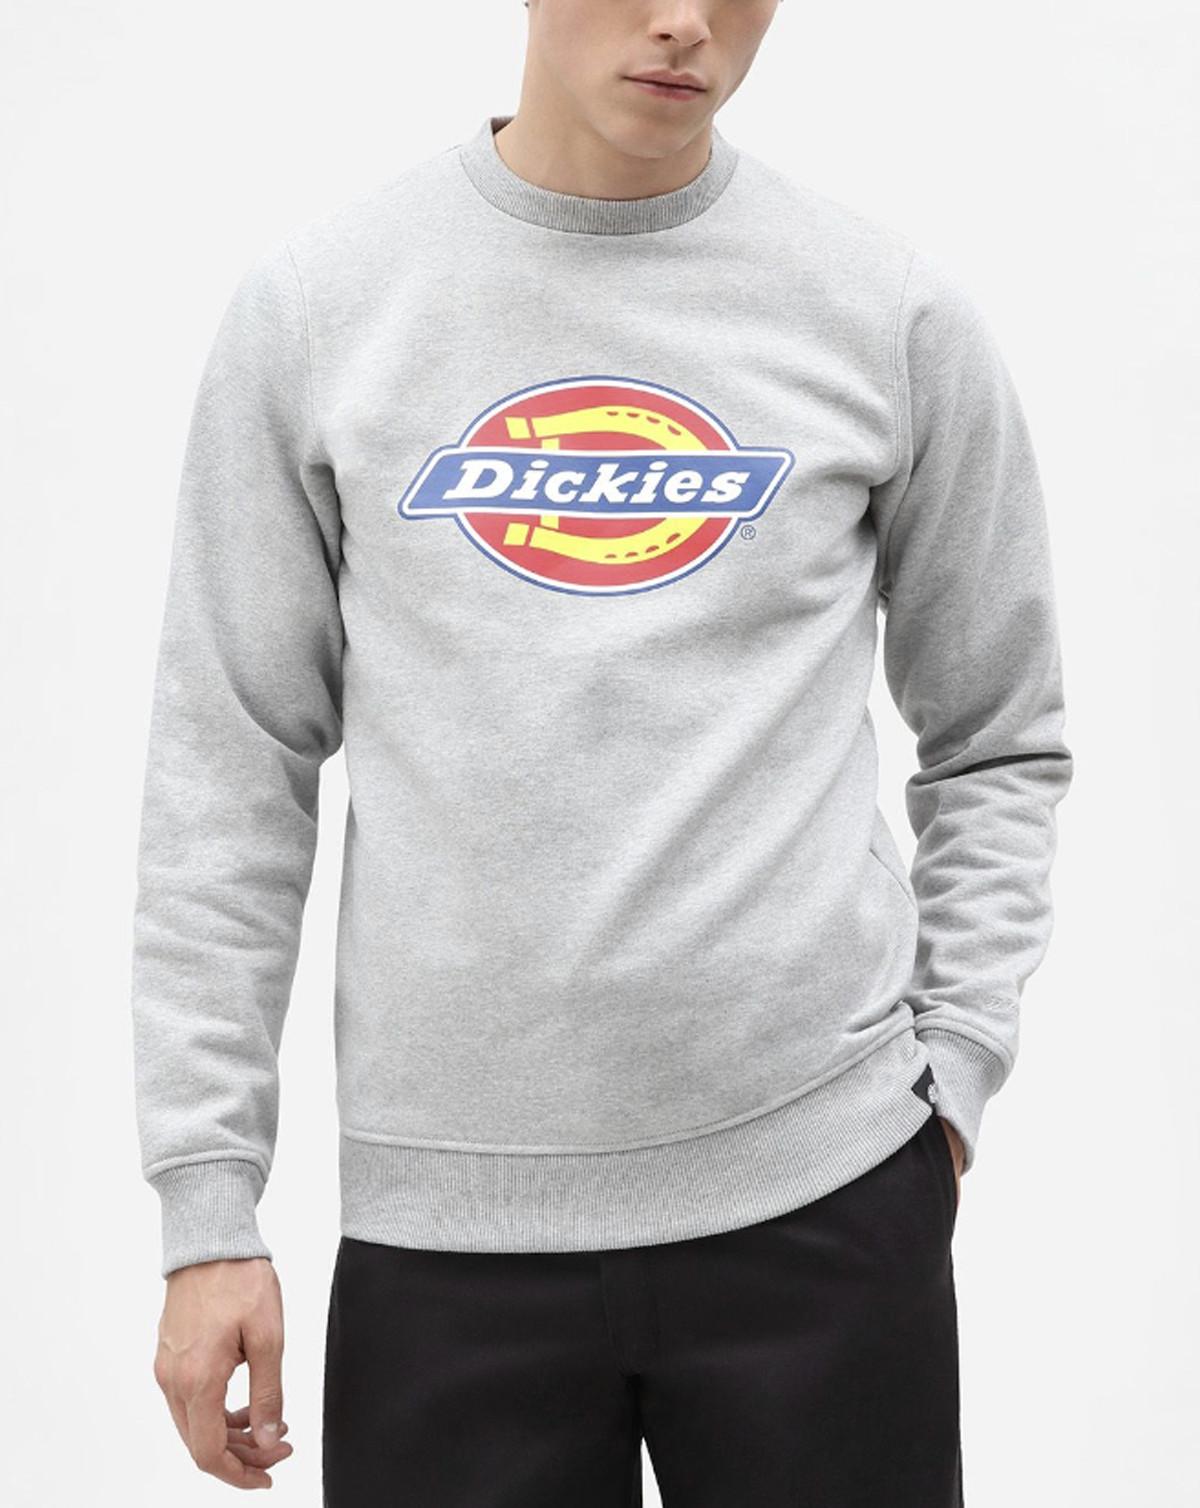 DICKIES Pittsburgh Sweatshirt (Gråmelerad, XS)